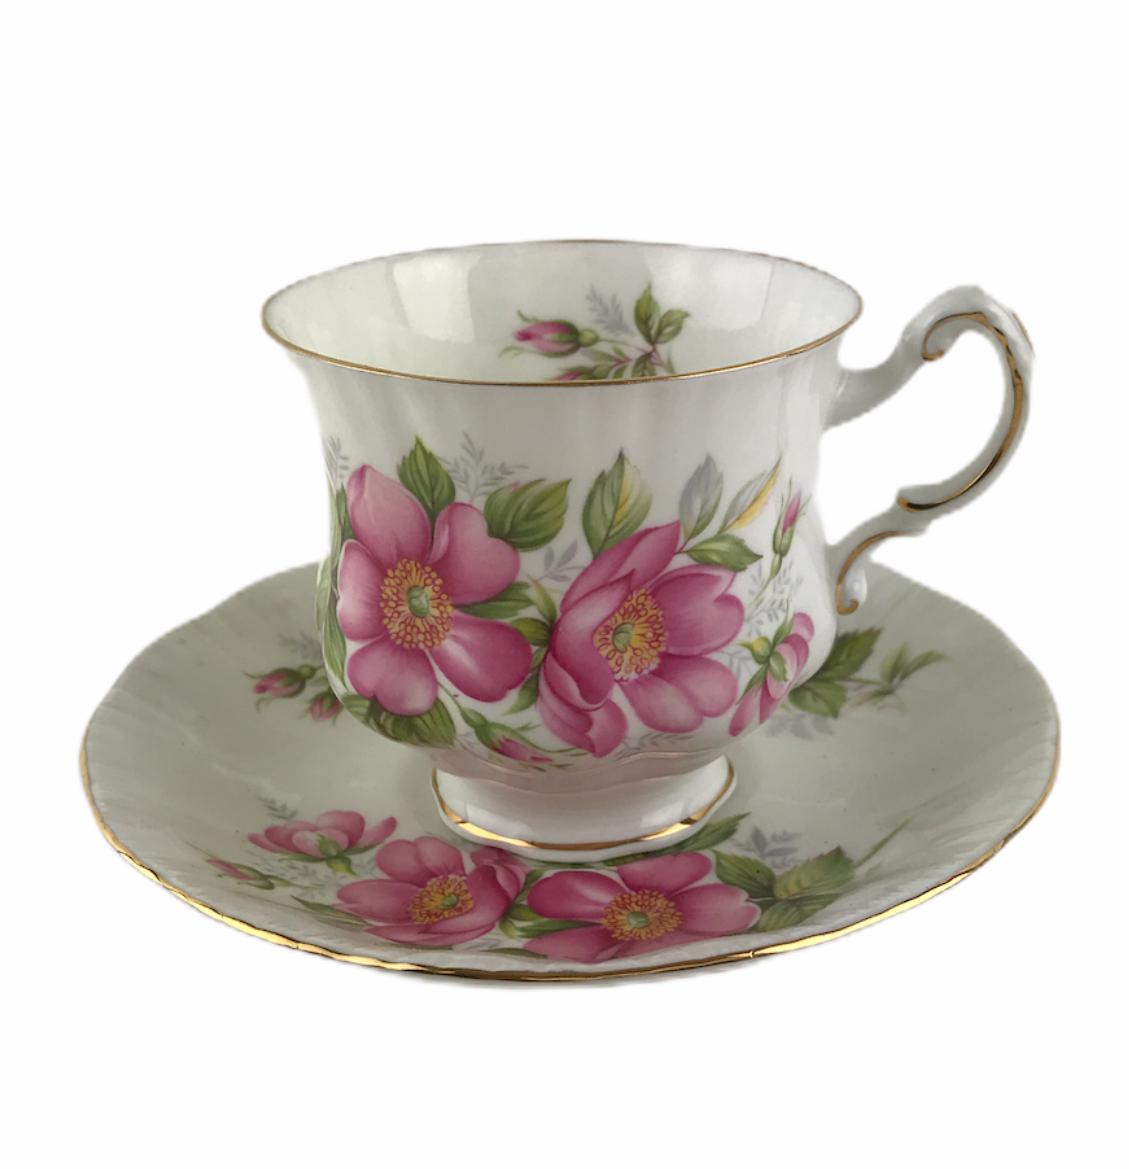 Vintage Paragon England Prairie Rose Floral Cup & Saucer Set Bone China England - $20.26